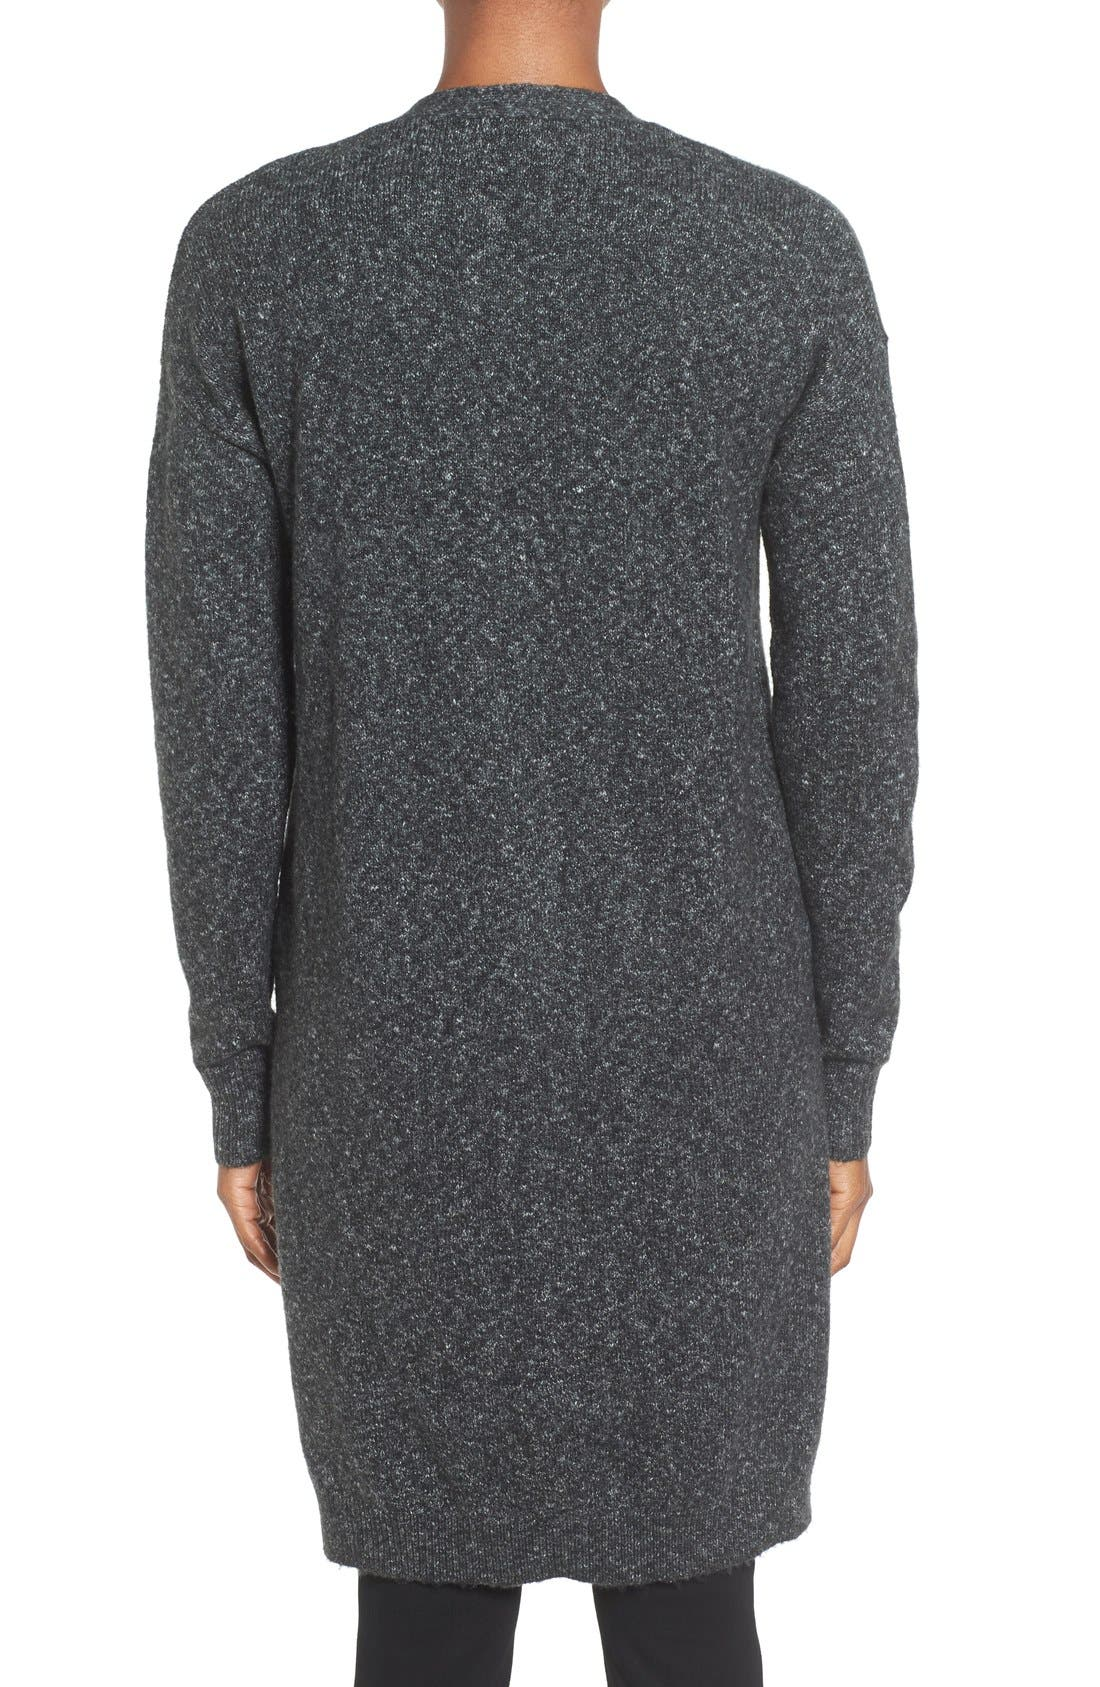 Long Knit Cardigan,                             Alternate thumbnail 2, color,                             Charcoal Marl